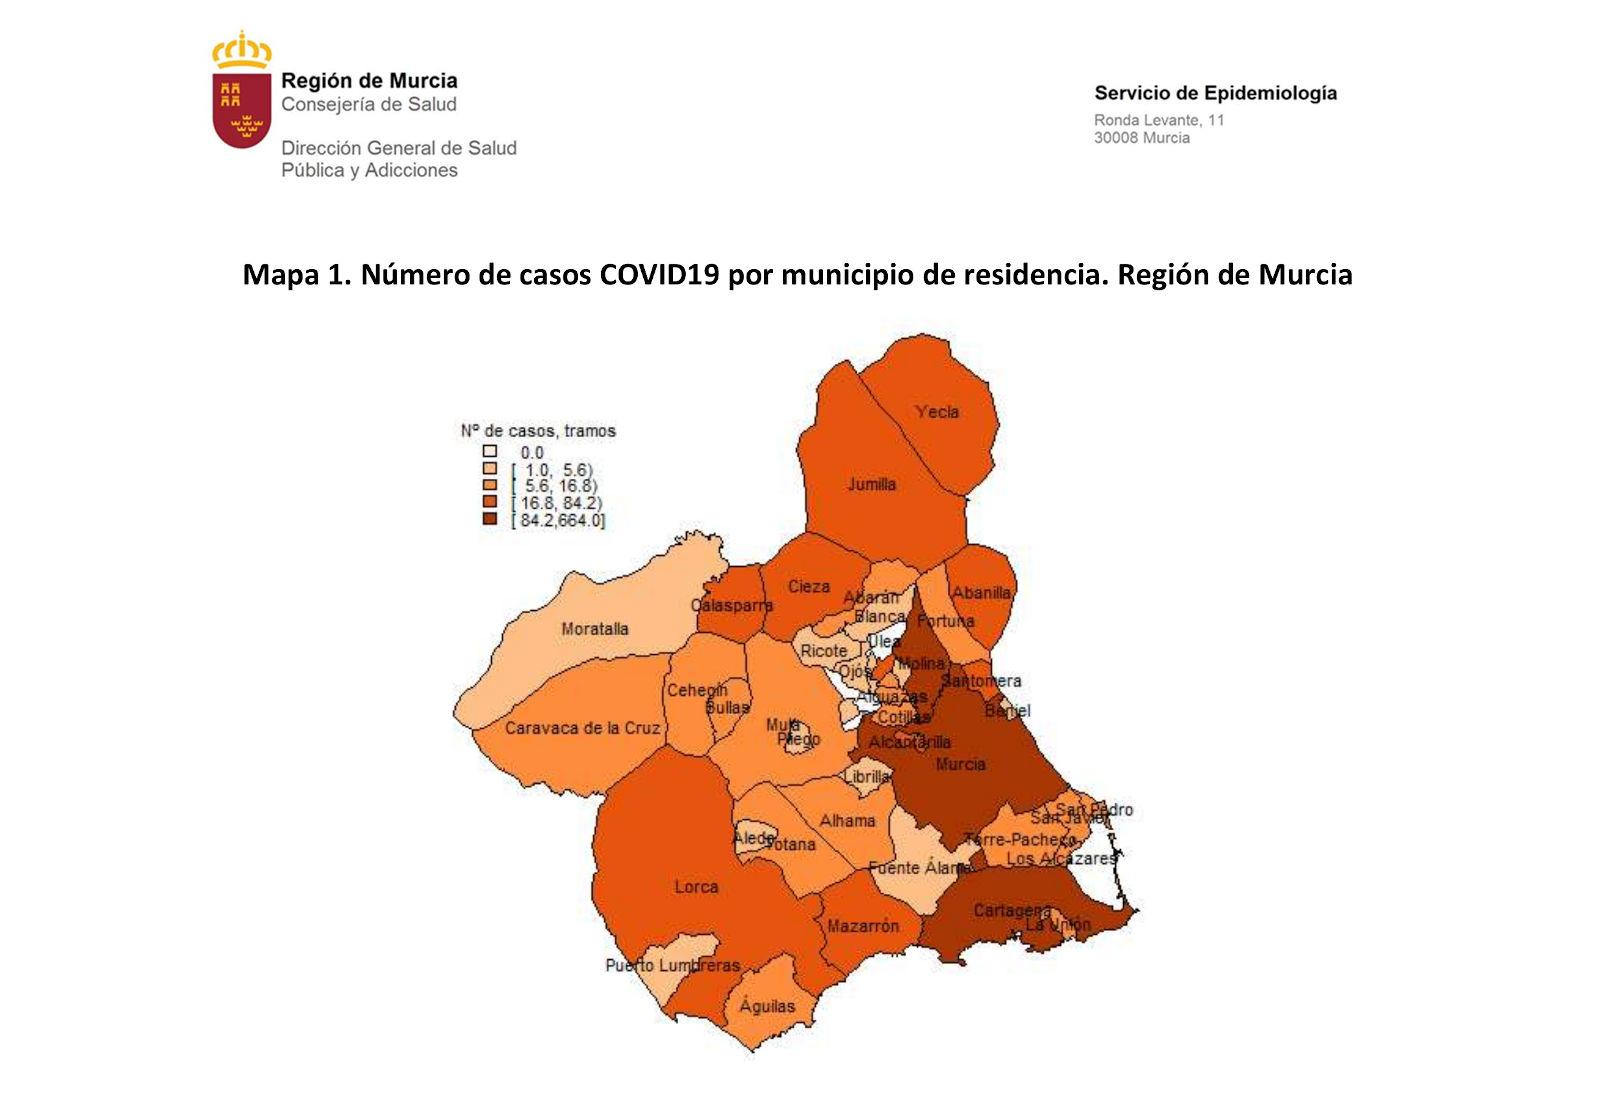 20200417_Informe COVID-19 Region de Murcia